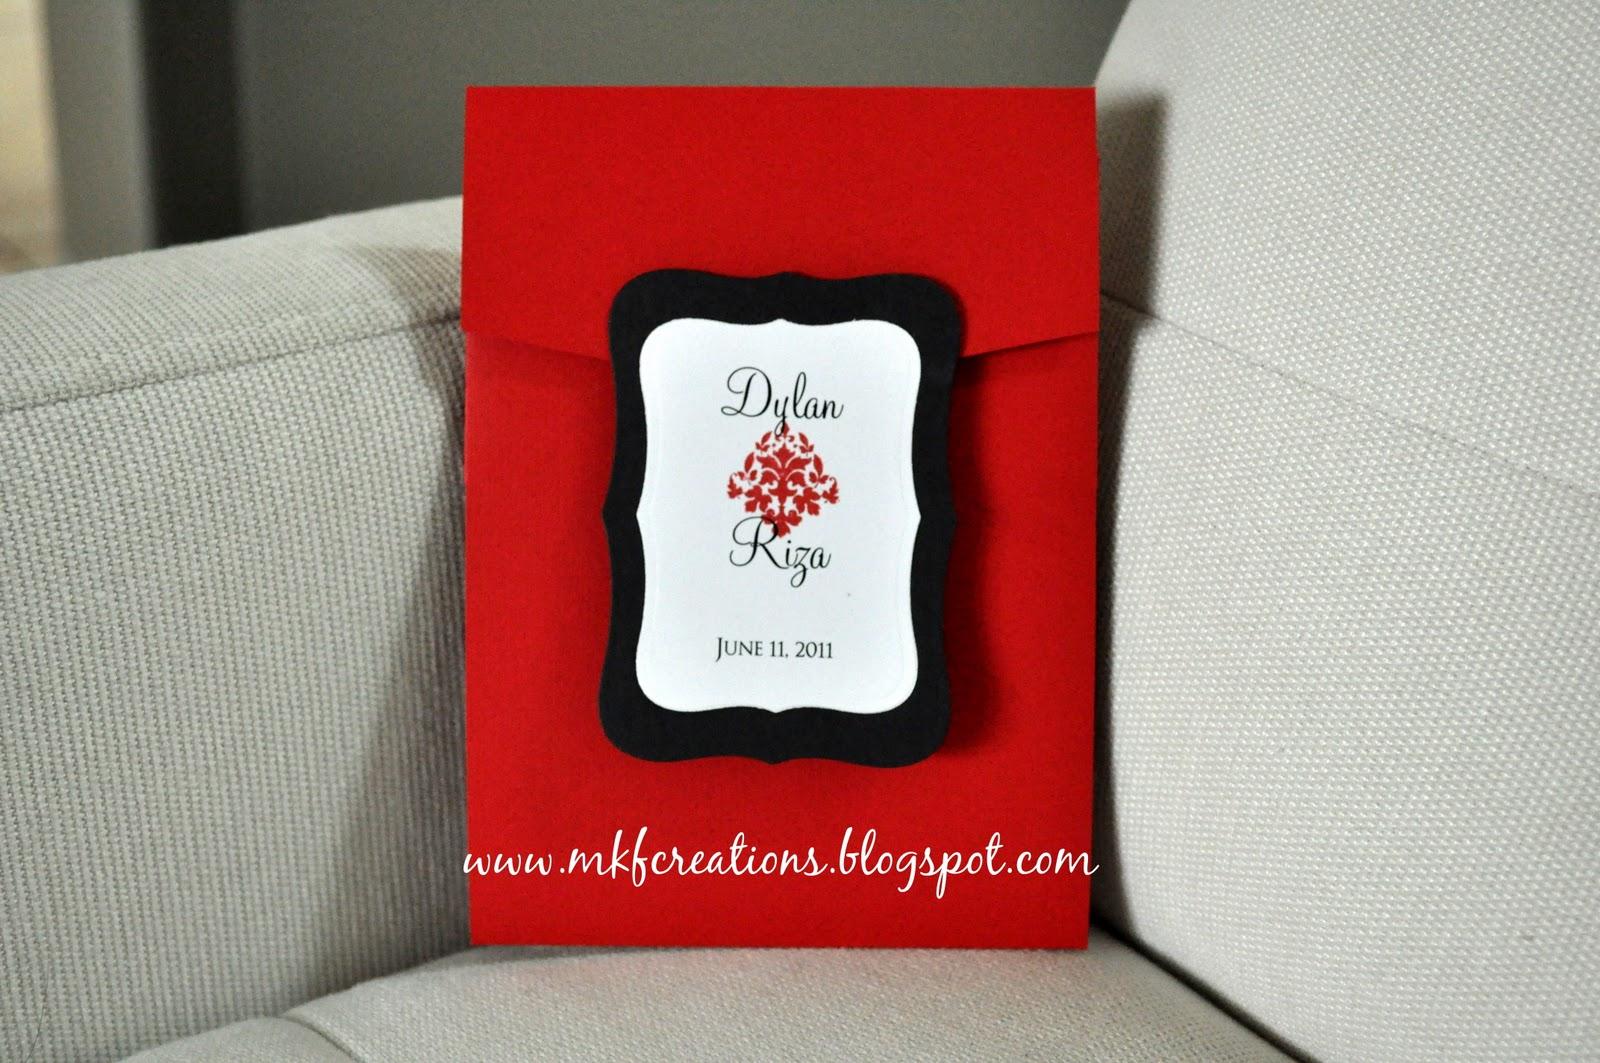 for wedding invitations